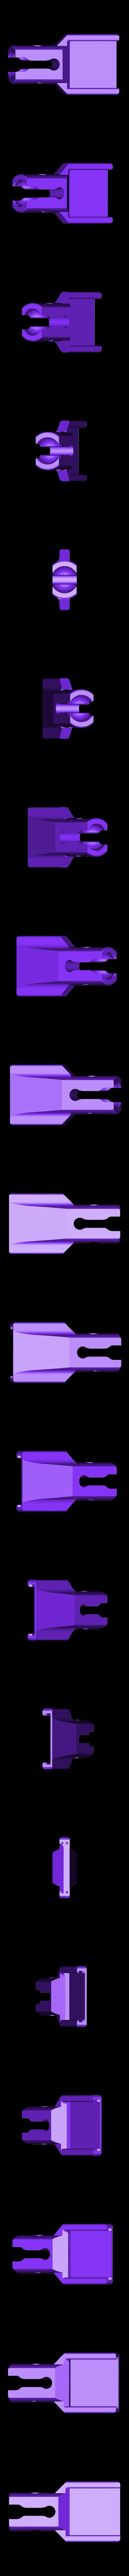 LinkM3_PiCam.stl Download free STL file Raspberry PI CAM Holder • 3D printable object, a69291954